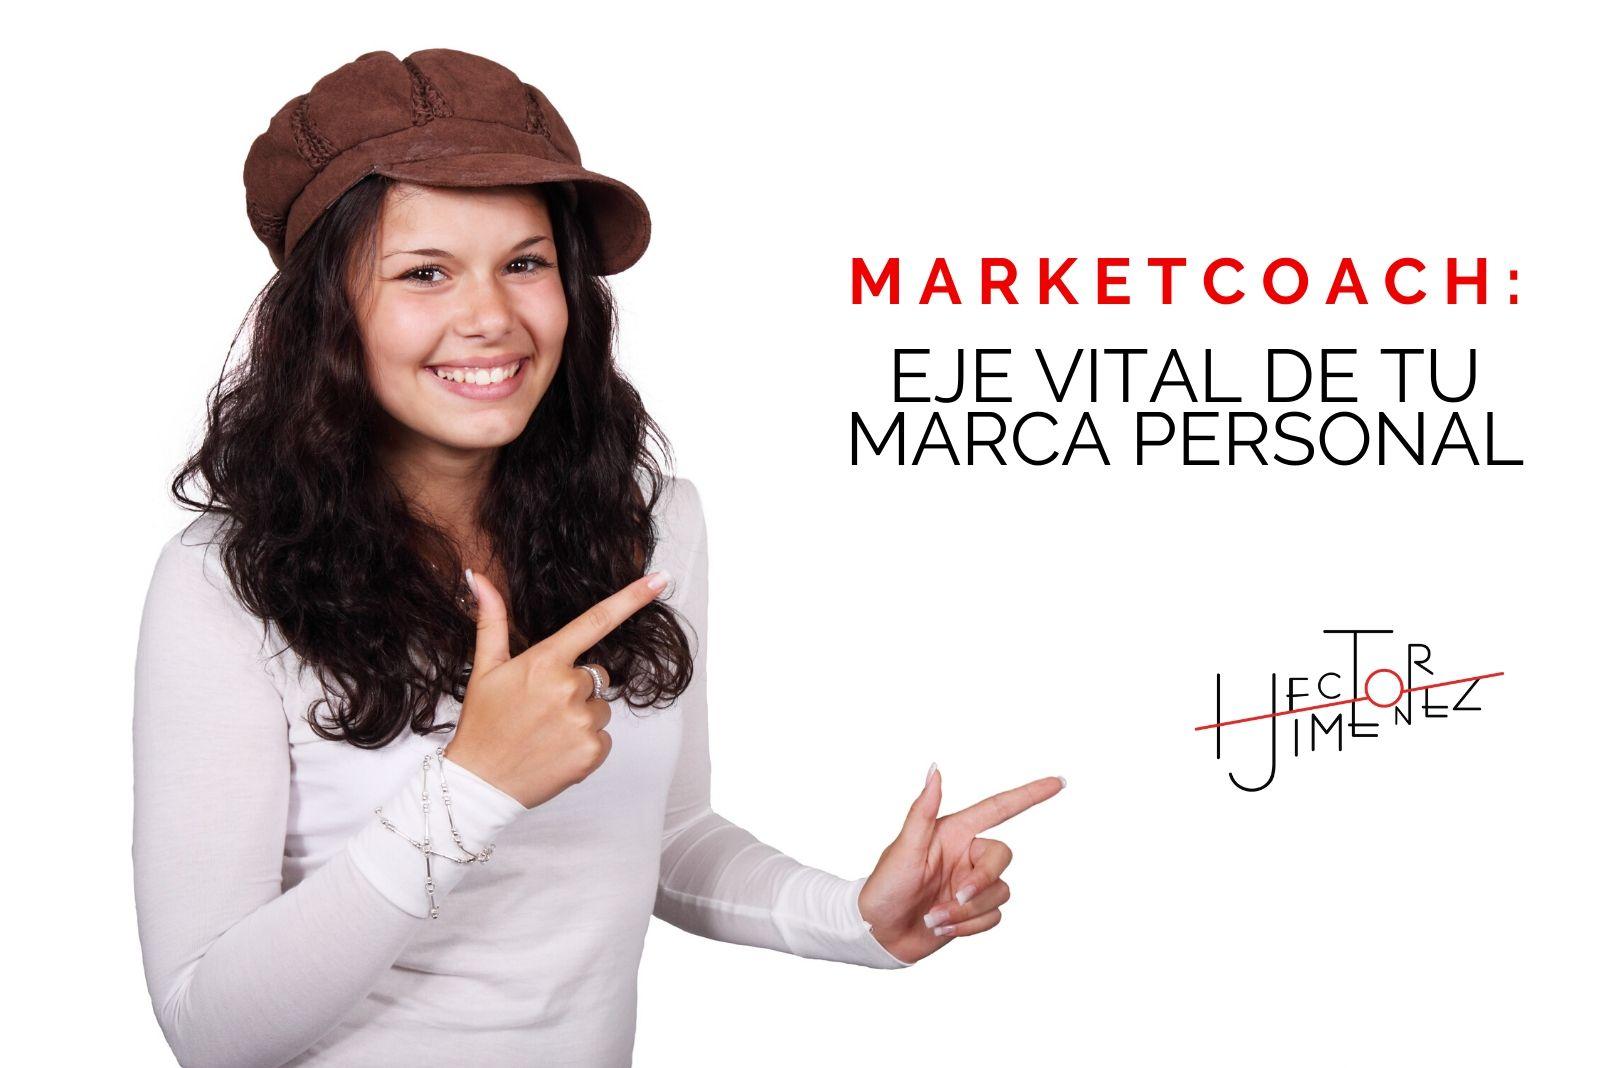 Héctor Jimenez - Qué es marketcoach 1